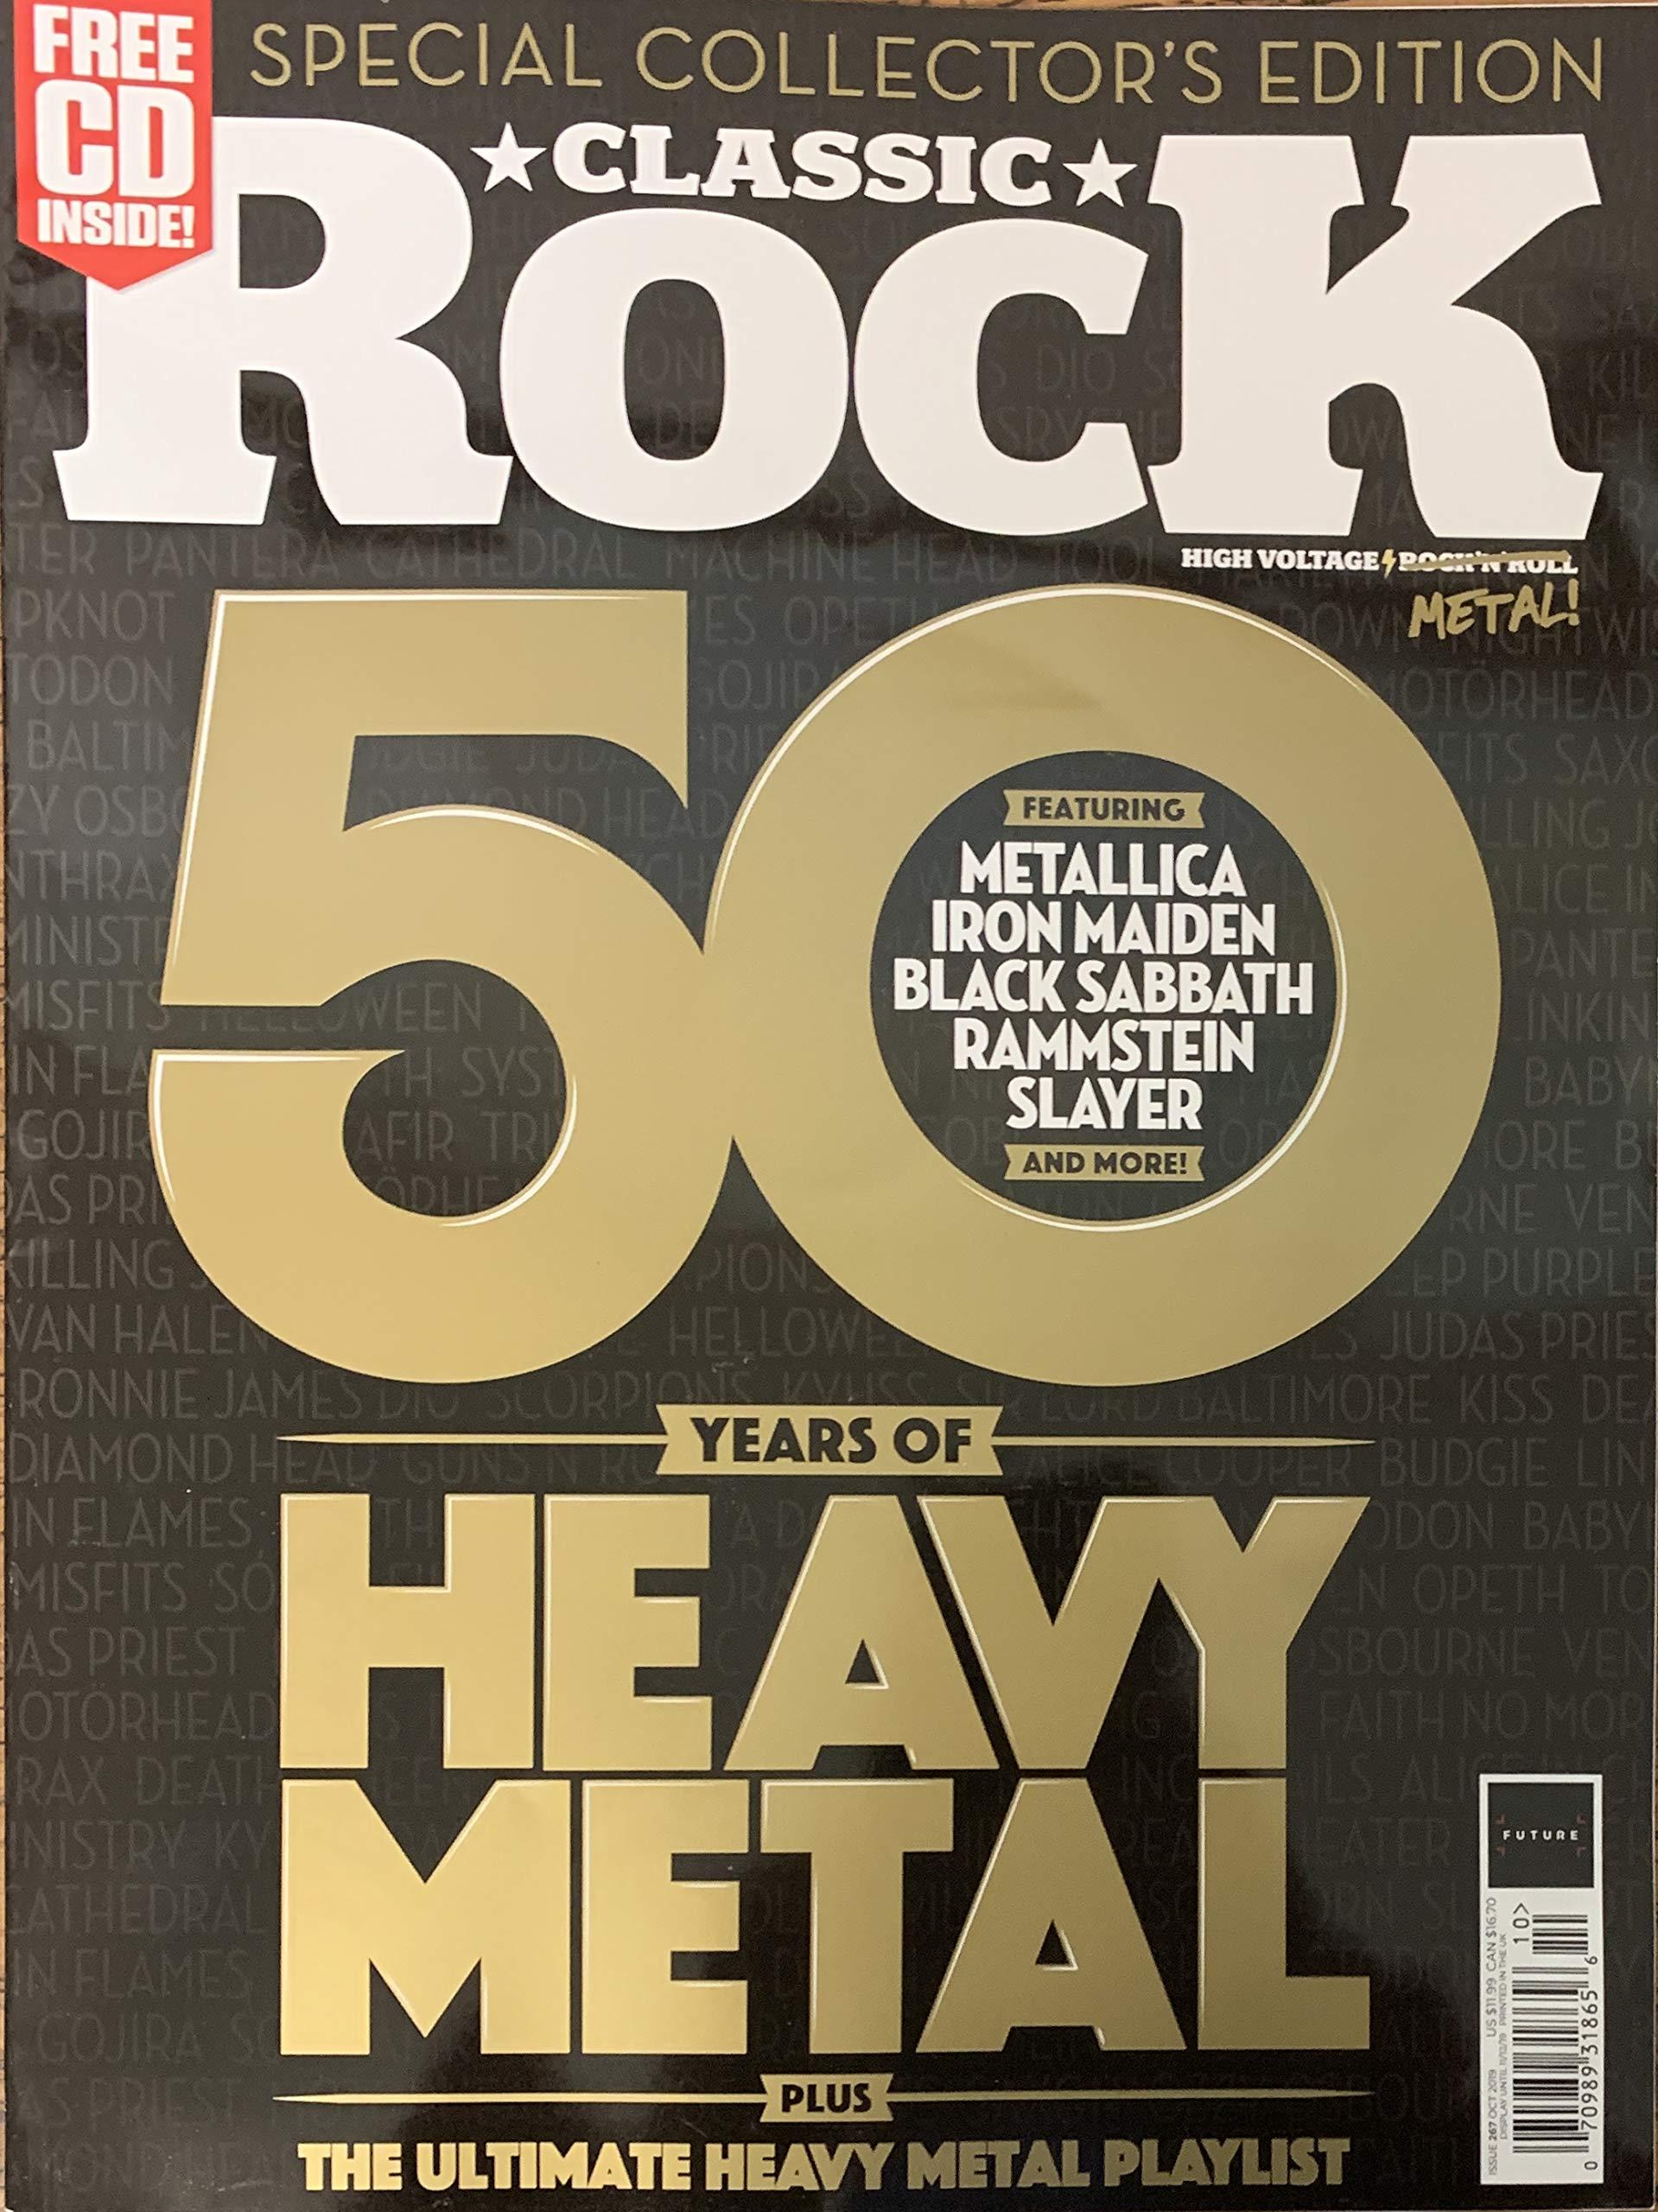 CLASSIC ROCK MAGAZINE UK - OCTOBER 2019 - 50 YEARS OF HEAVY METAL:  Amazon.com: Books